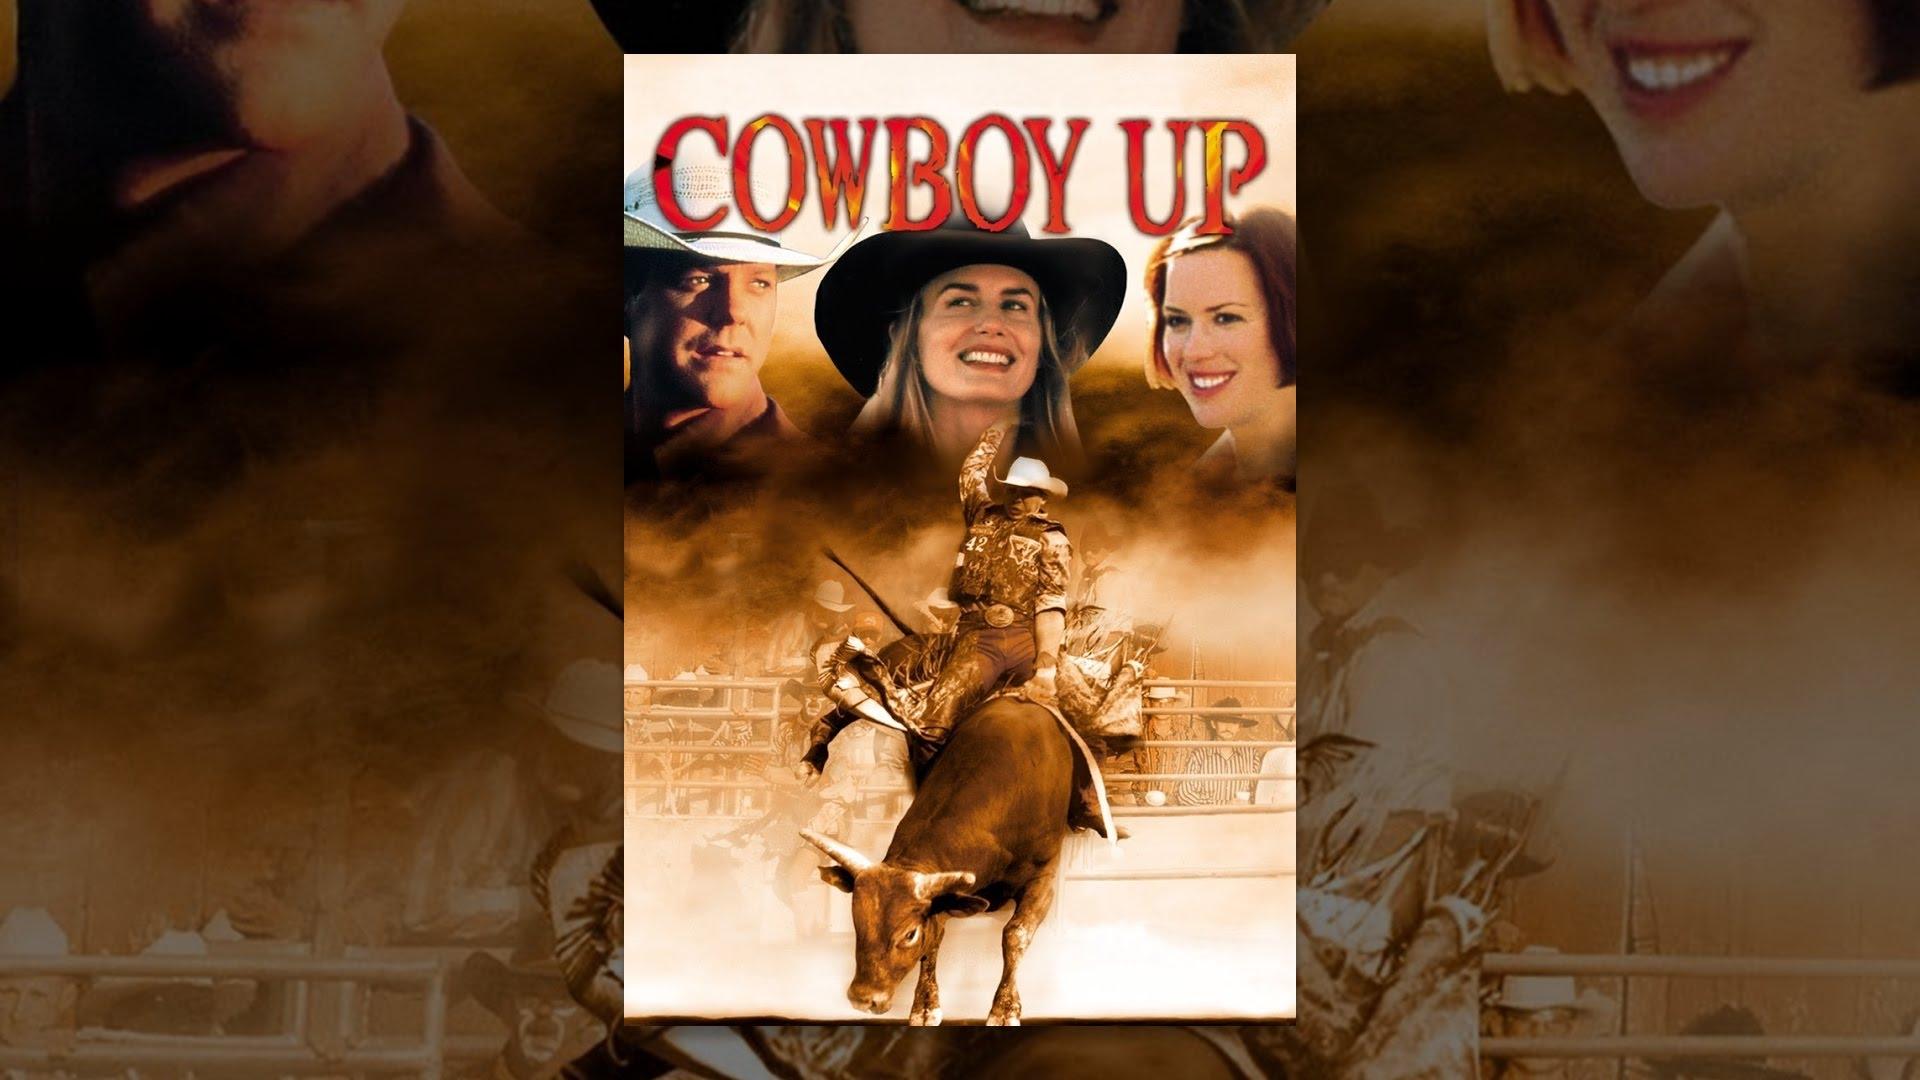 Cowboy Up - YouTube